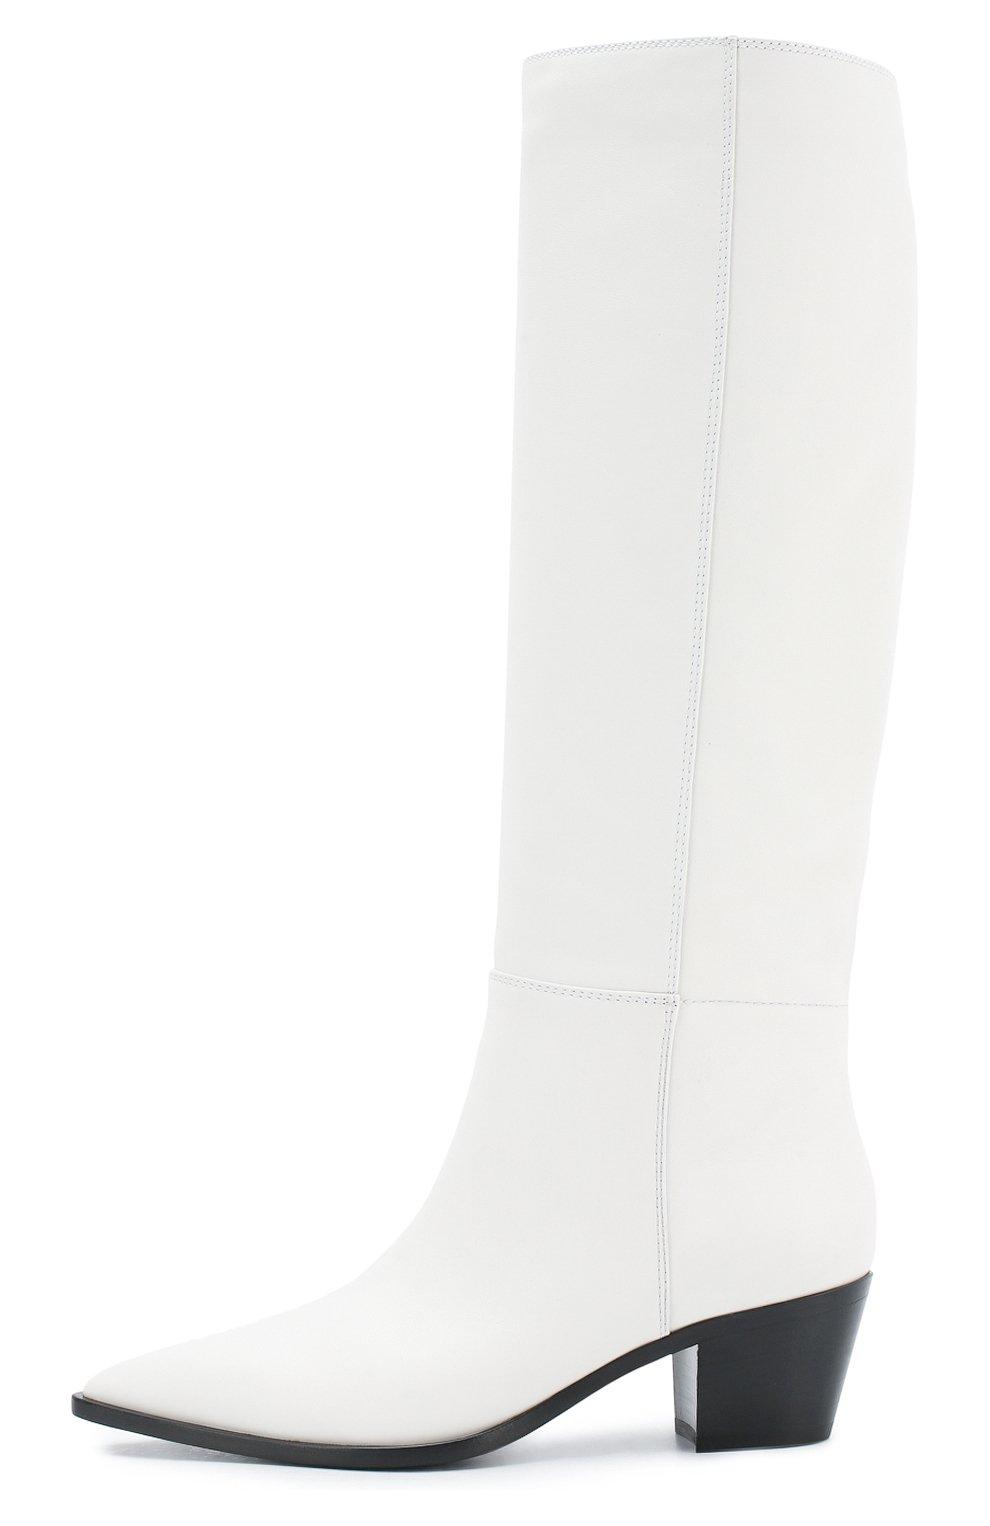 Кожаные сапоги Daenerys Gianvito Rossi белые | Фото №3